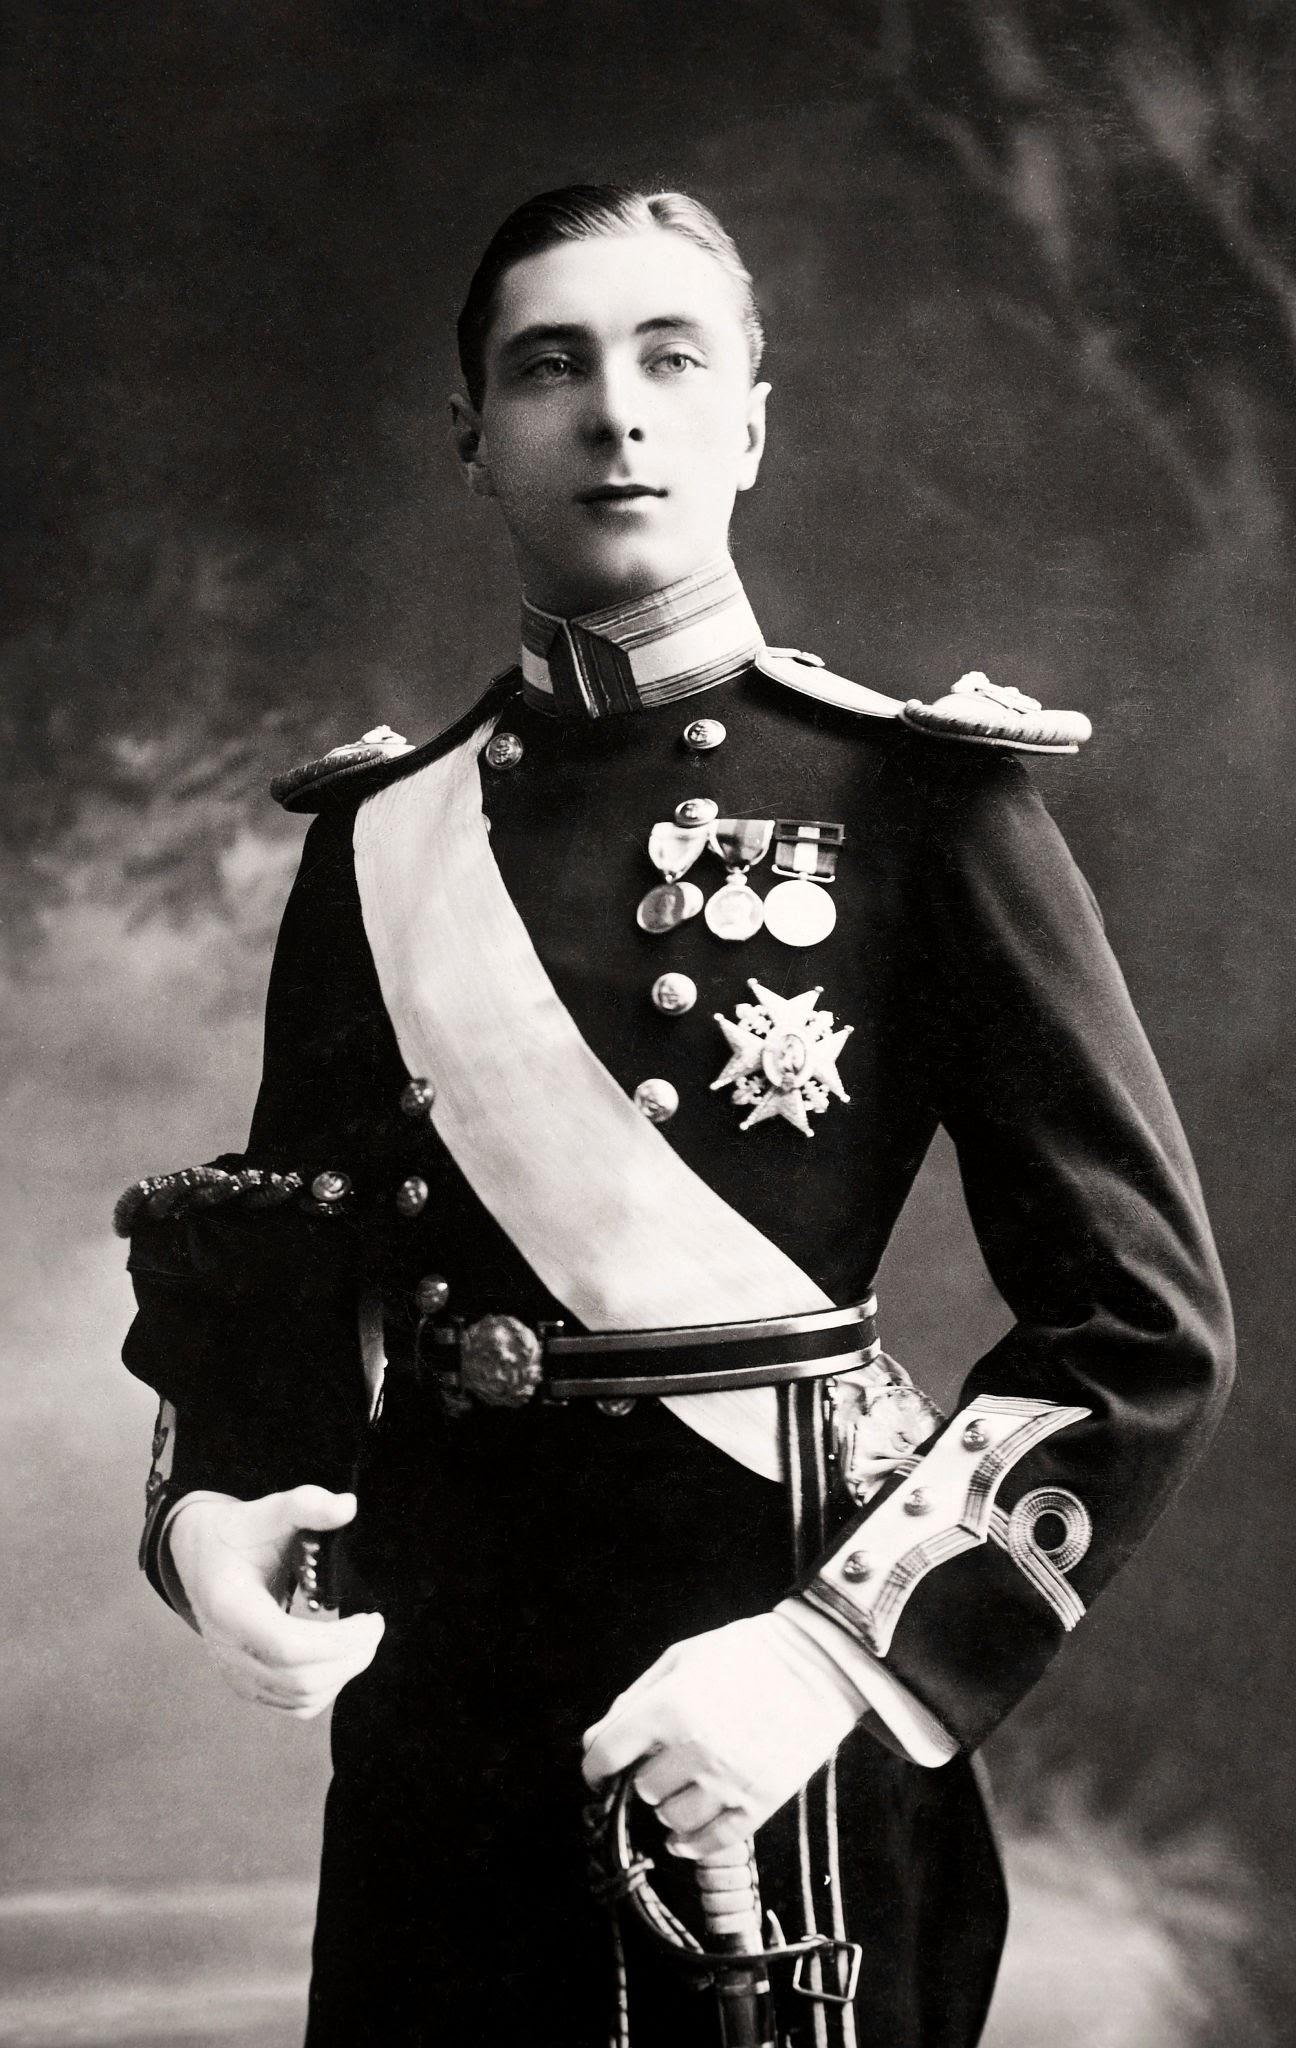 https://upload.wikimedia.org/wikipedia/commons/6/6f/Alexander_of_Battenberg%2C_Marquess_of_Carisbrooke.jpg